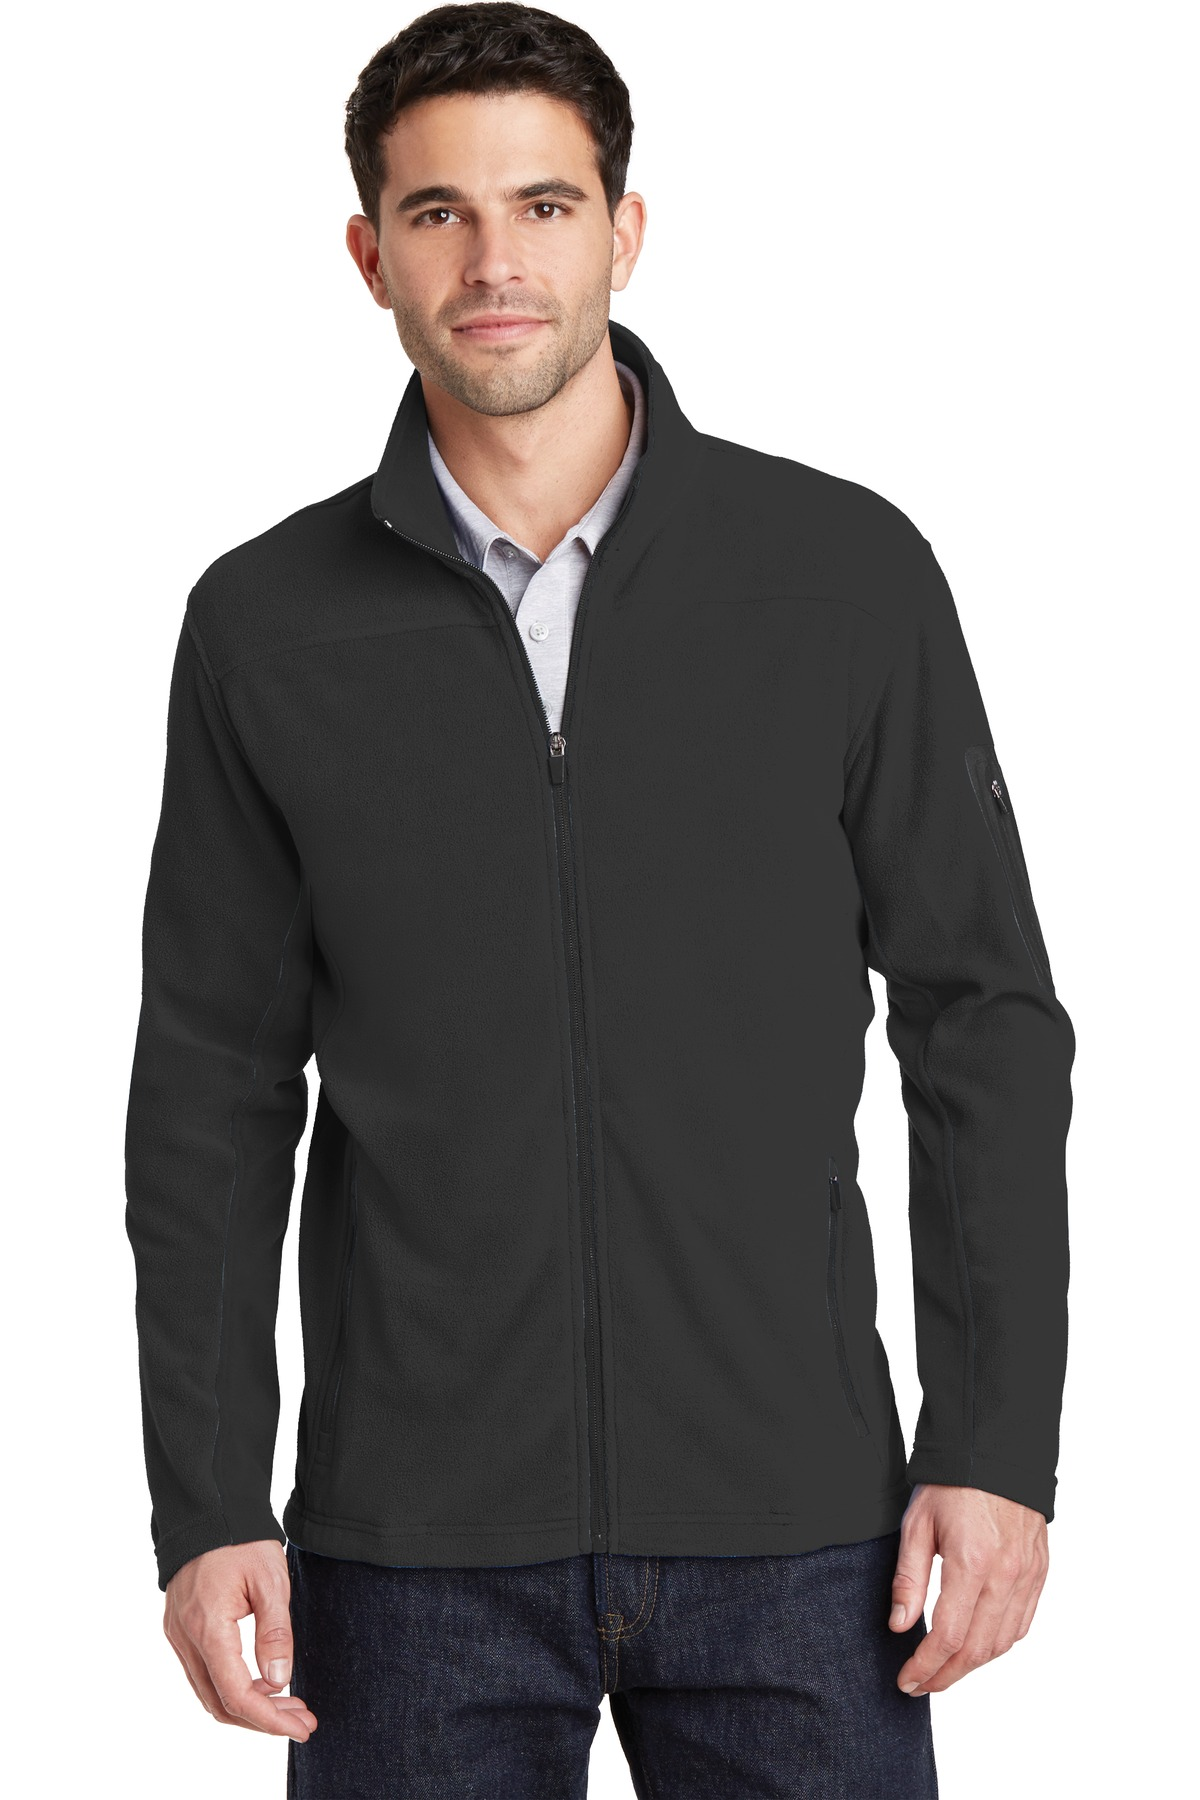 Port Authority Summit Fleece Full-Zip Jacket. -Port Authority